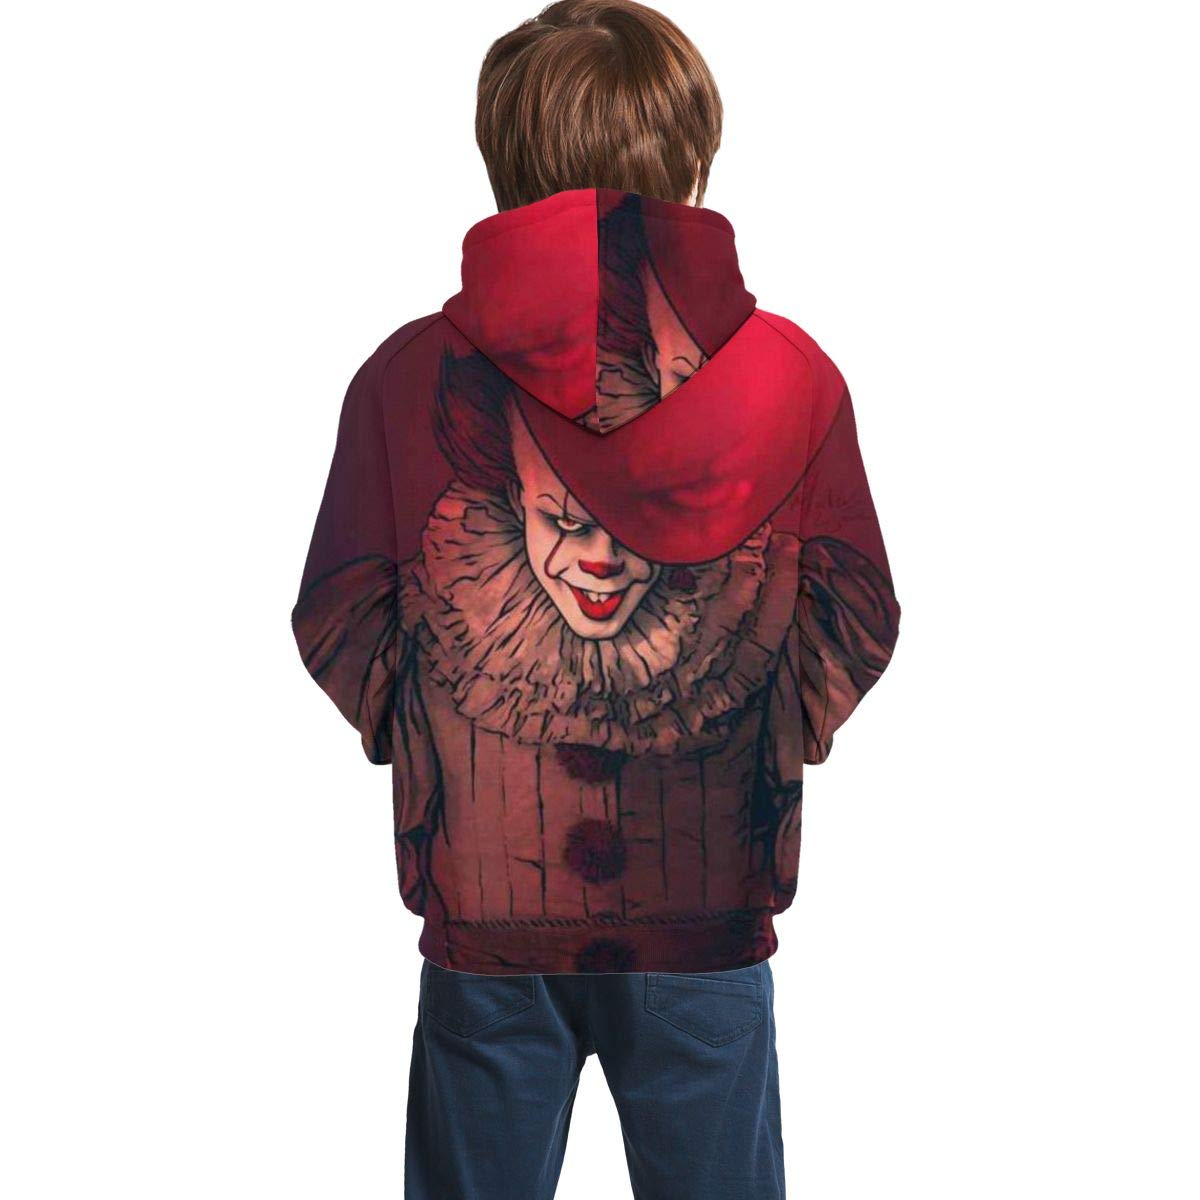 Rebrseecca Mo Kids//Youth Hoodies Pen-Nywi-Se 3D Print Unisex Plus Velvet Pullover Hooded Sweatshirts for Boys//Girls//Teen